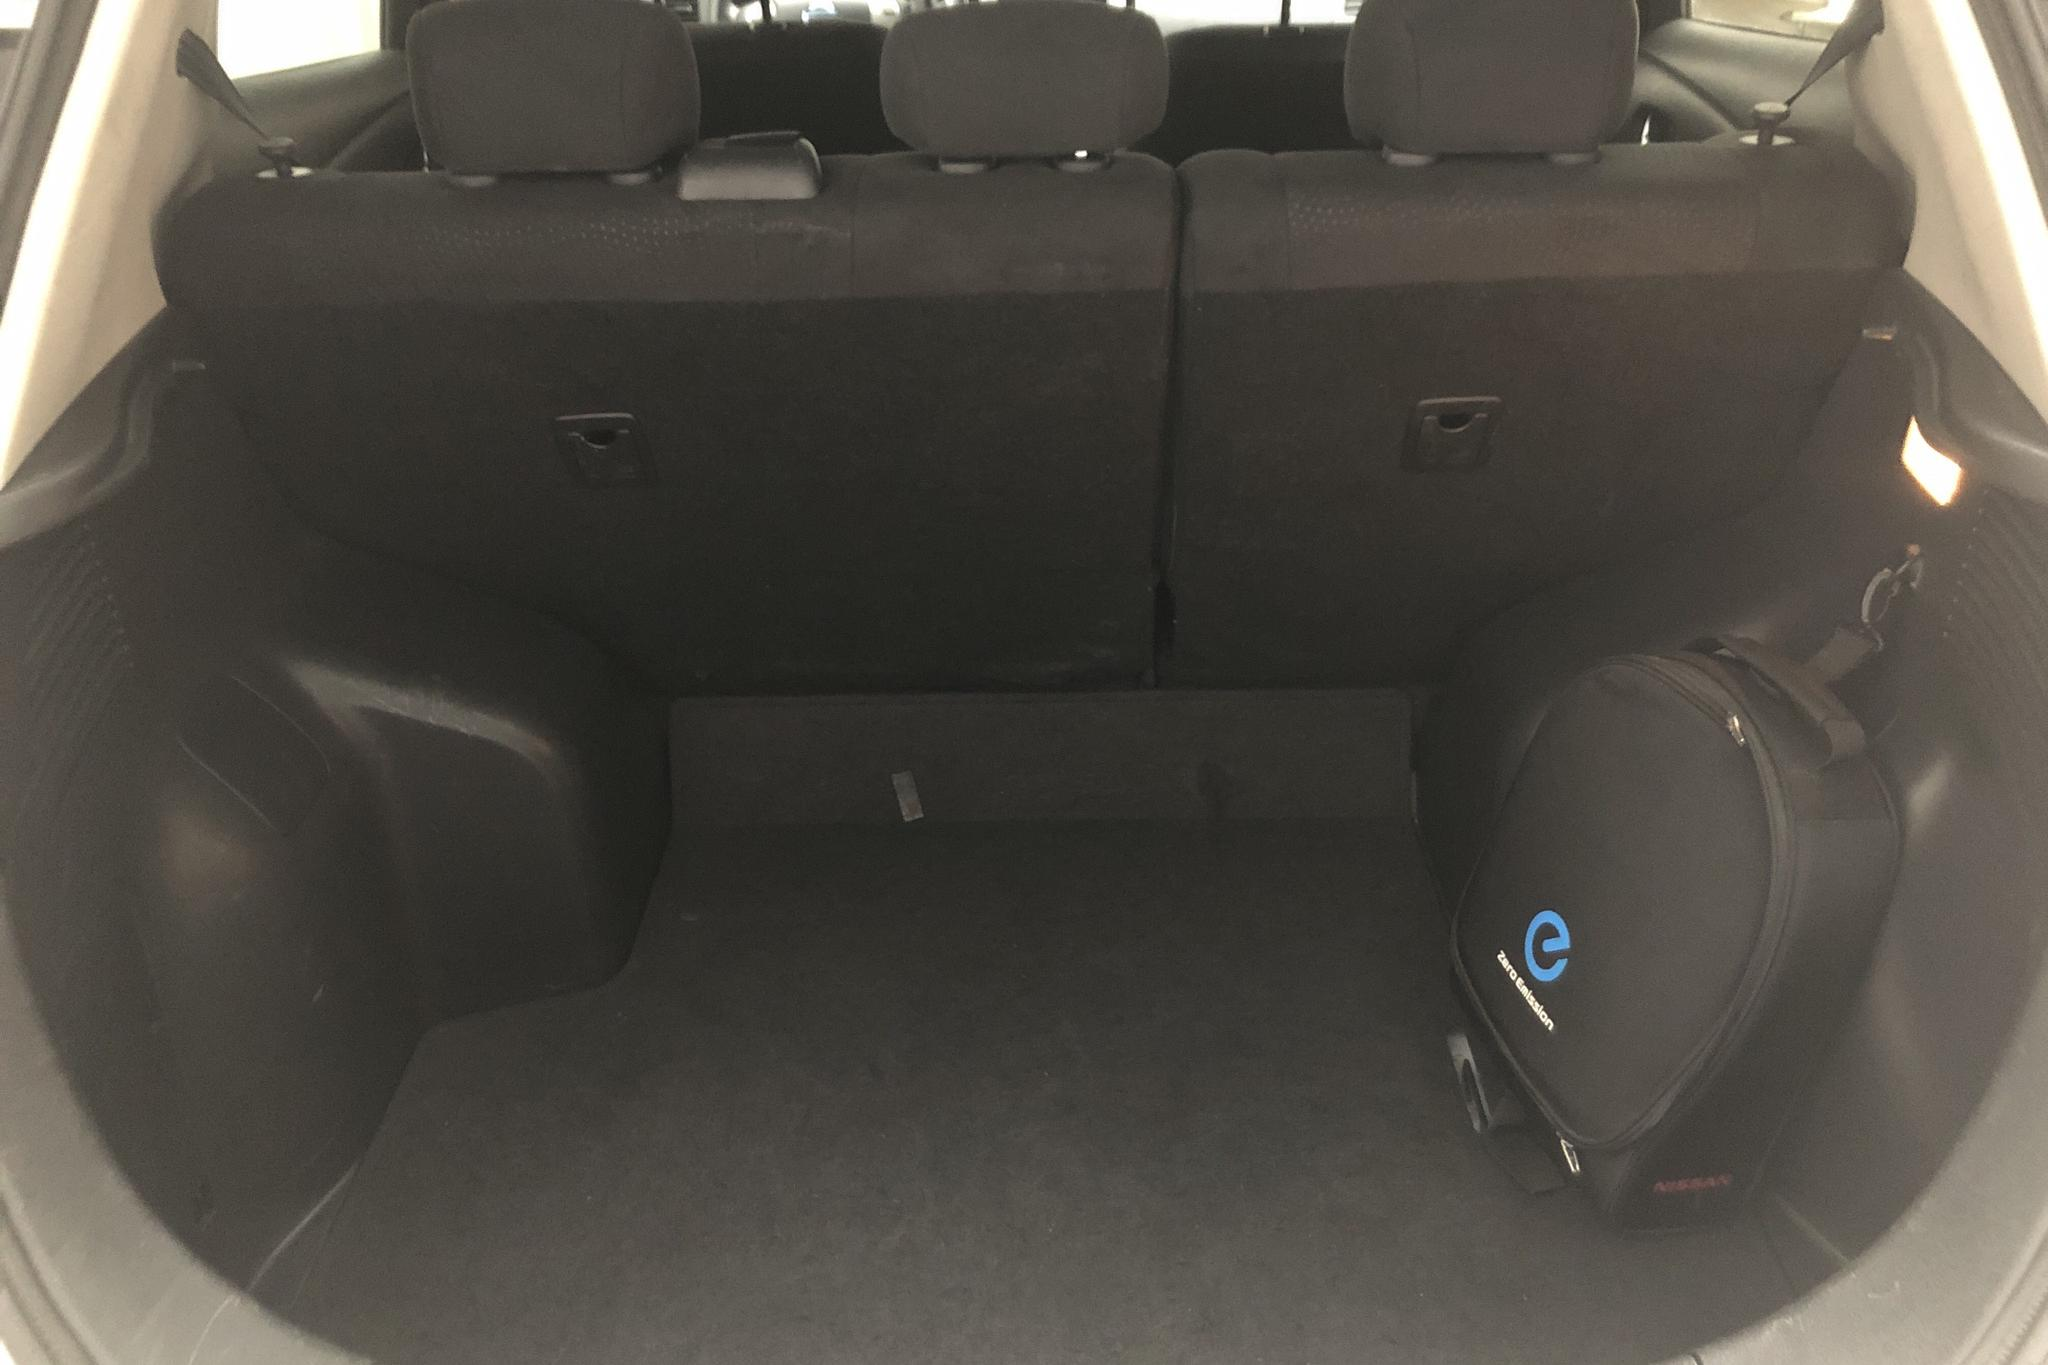 Nissan LEAF 5dr (109hk) - 40 630 km - Automatic - white - 2017